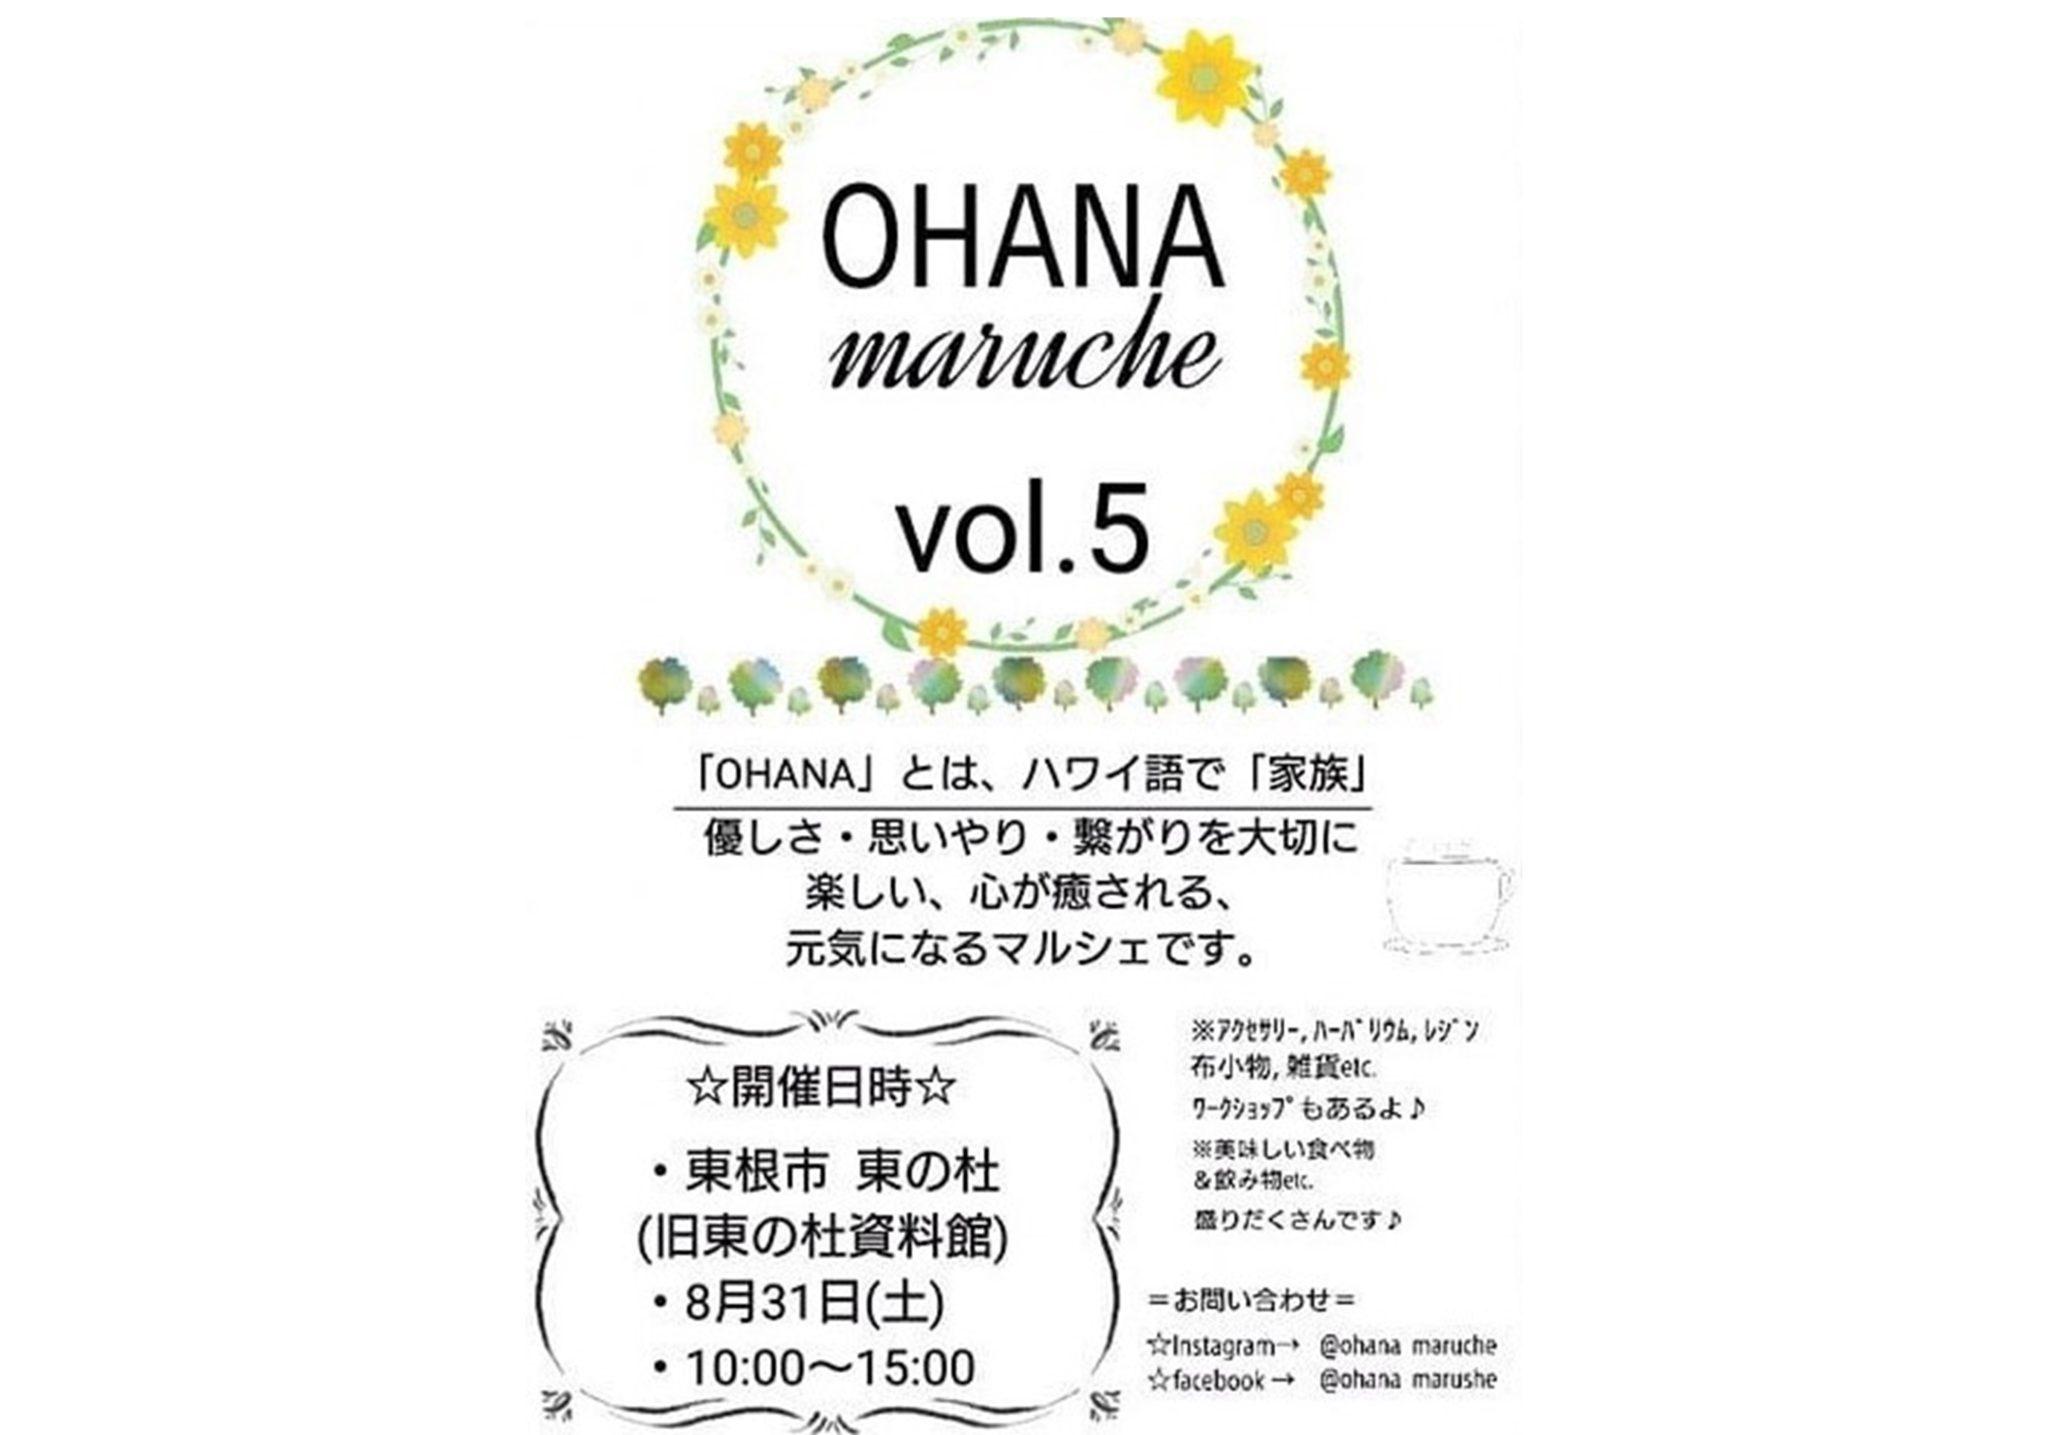 OHANA Marche vol.5